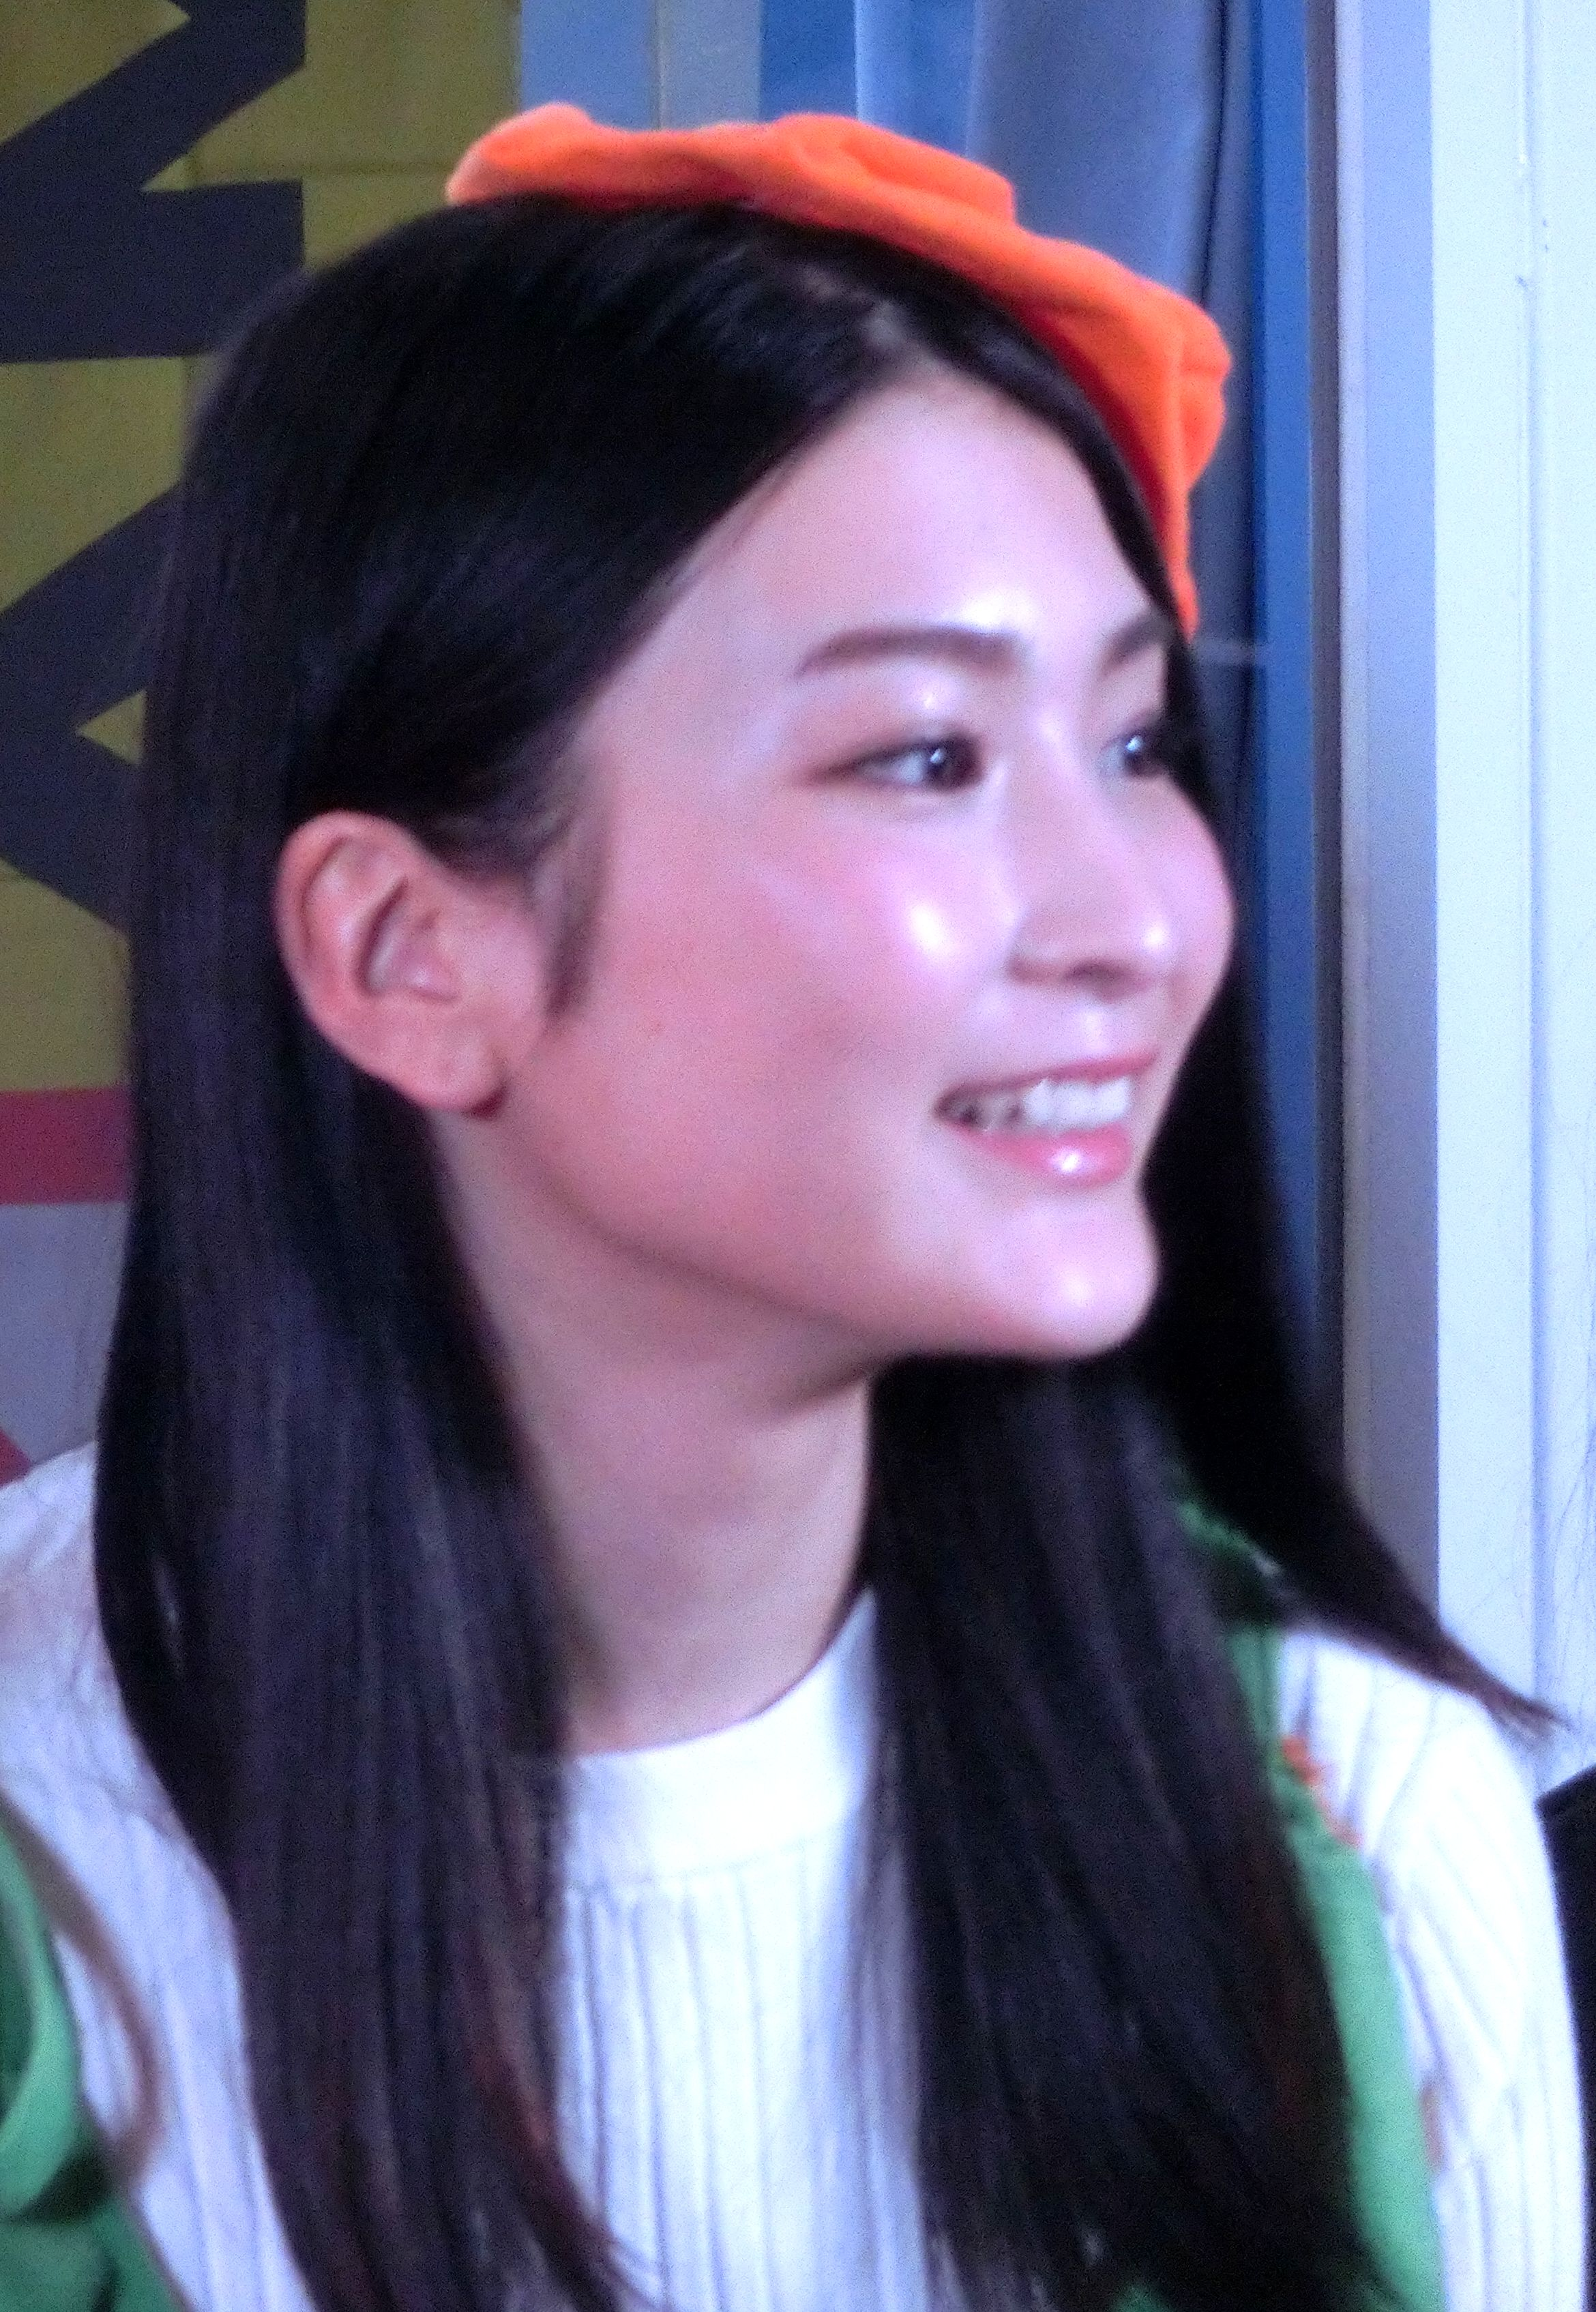 Av 女優 No 1 本庄鈴- 维基百科,自由的百科全书